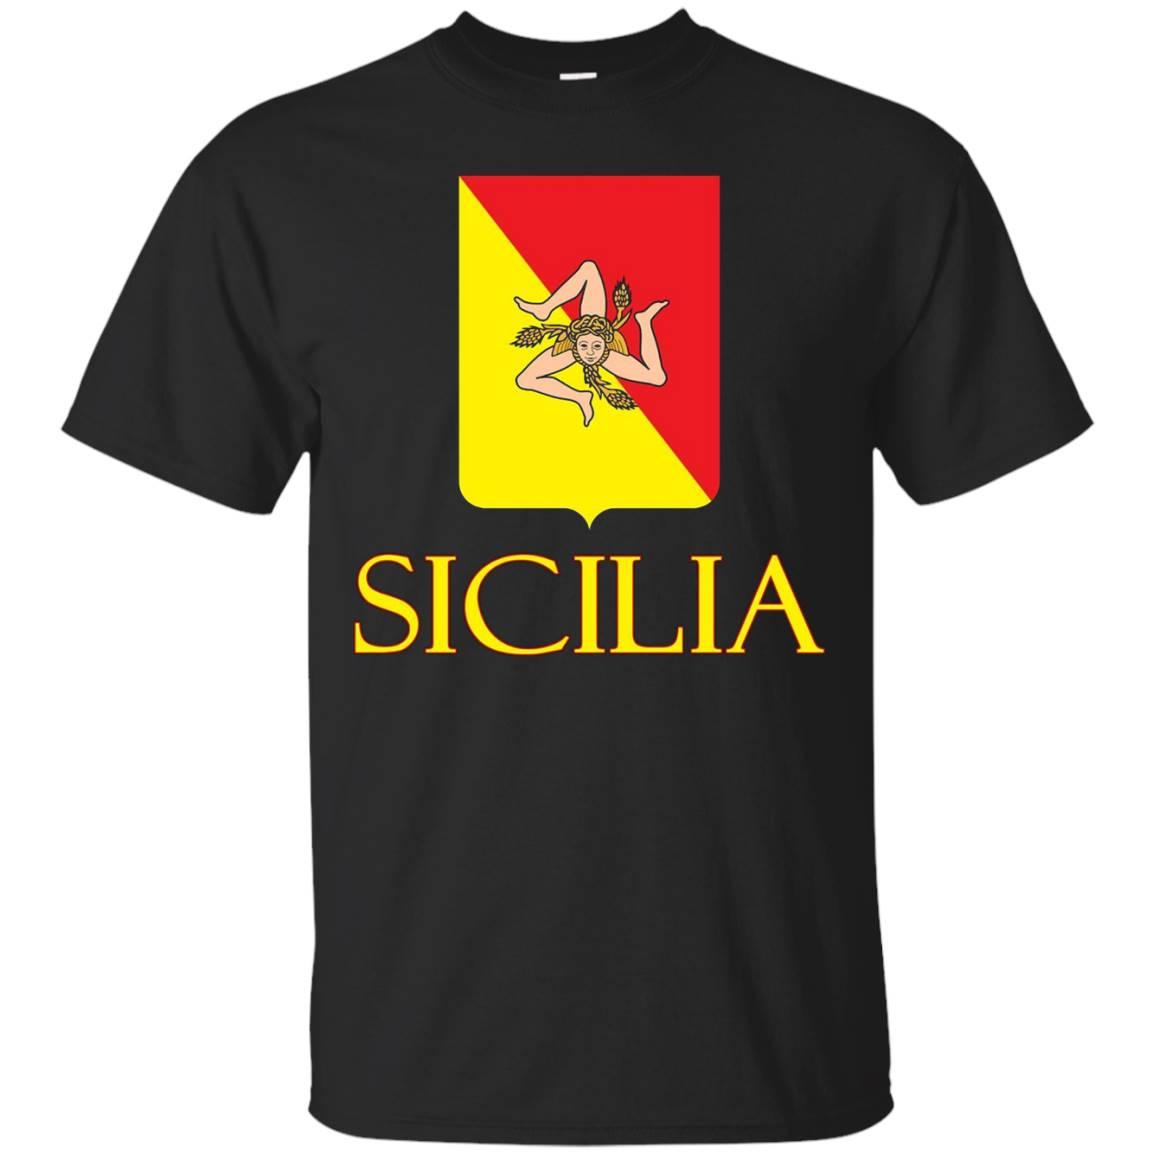 Sicilia – Sicily, Italy – Coat of Arms